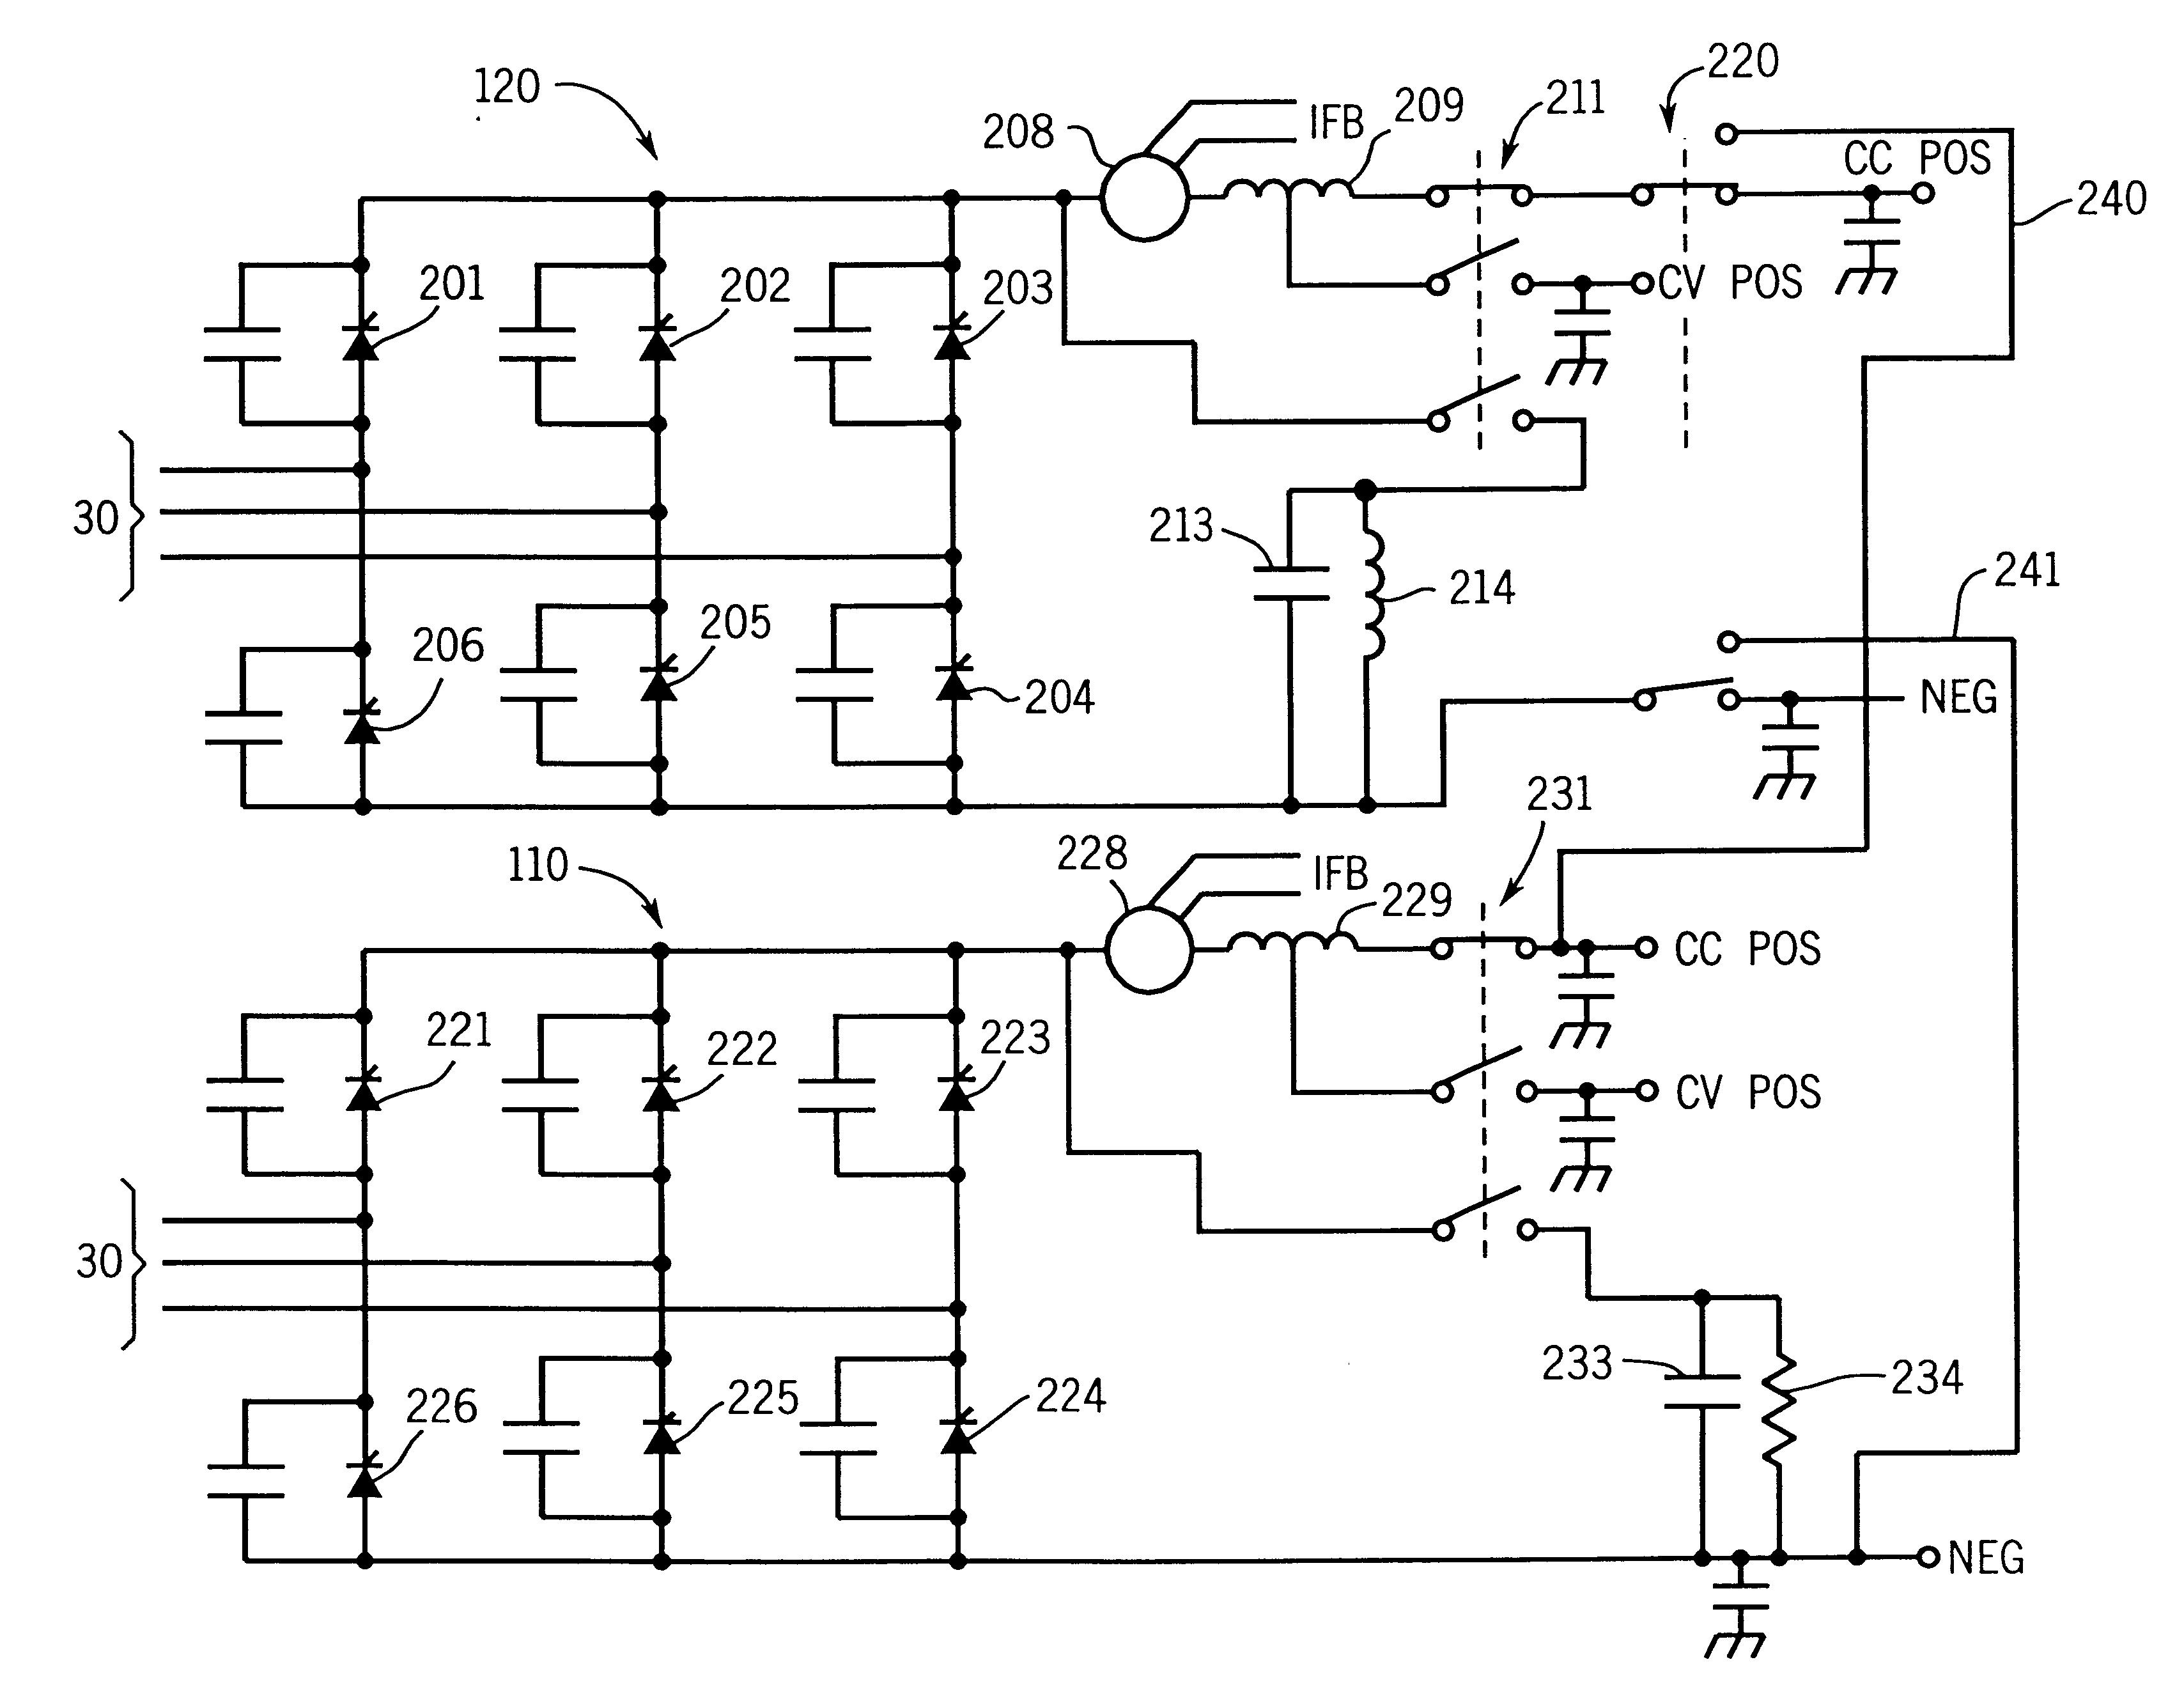 wiring diagram generator denyo wiring diagram for olympian rh color castles com denyo welder generator wiring diagram Denyo Generator 45 Sp